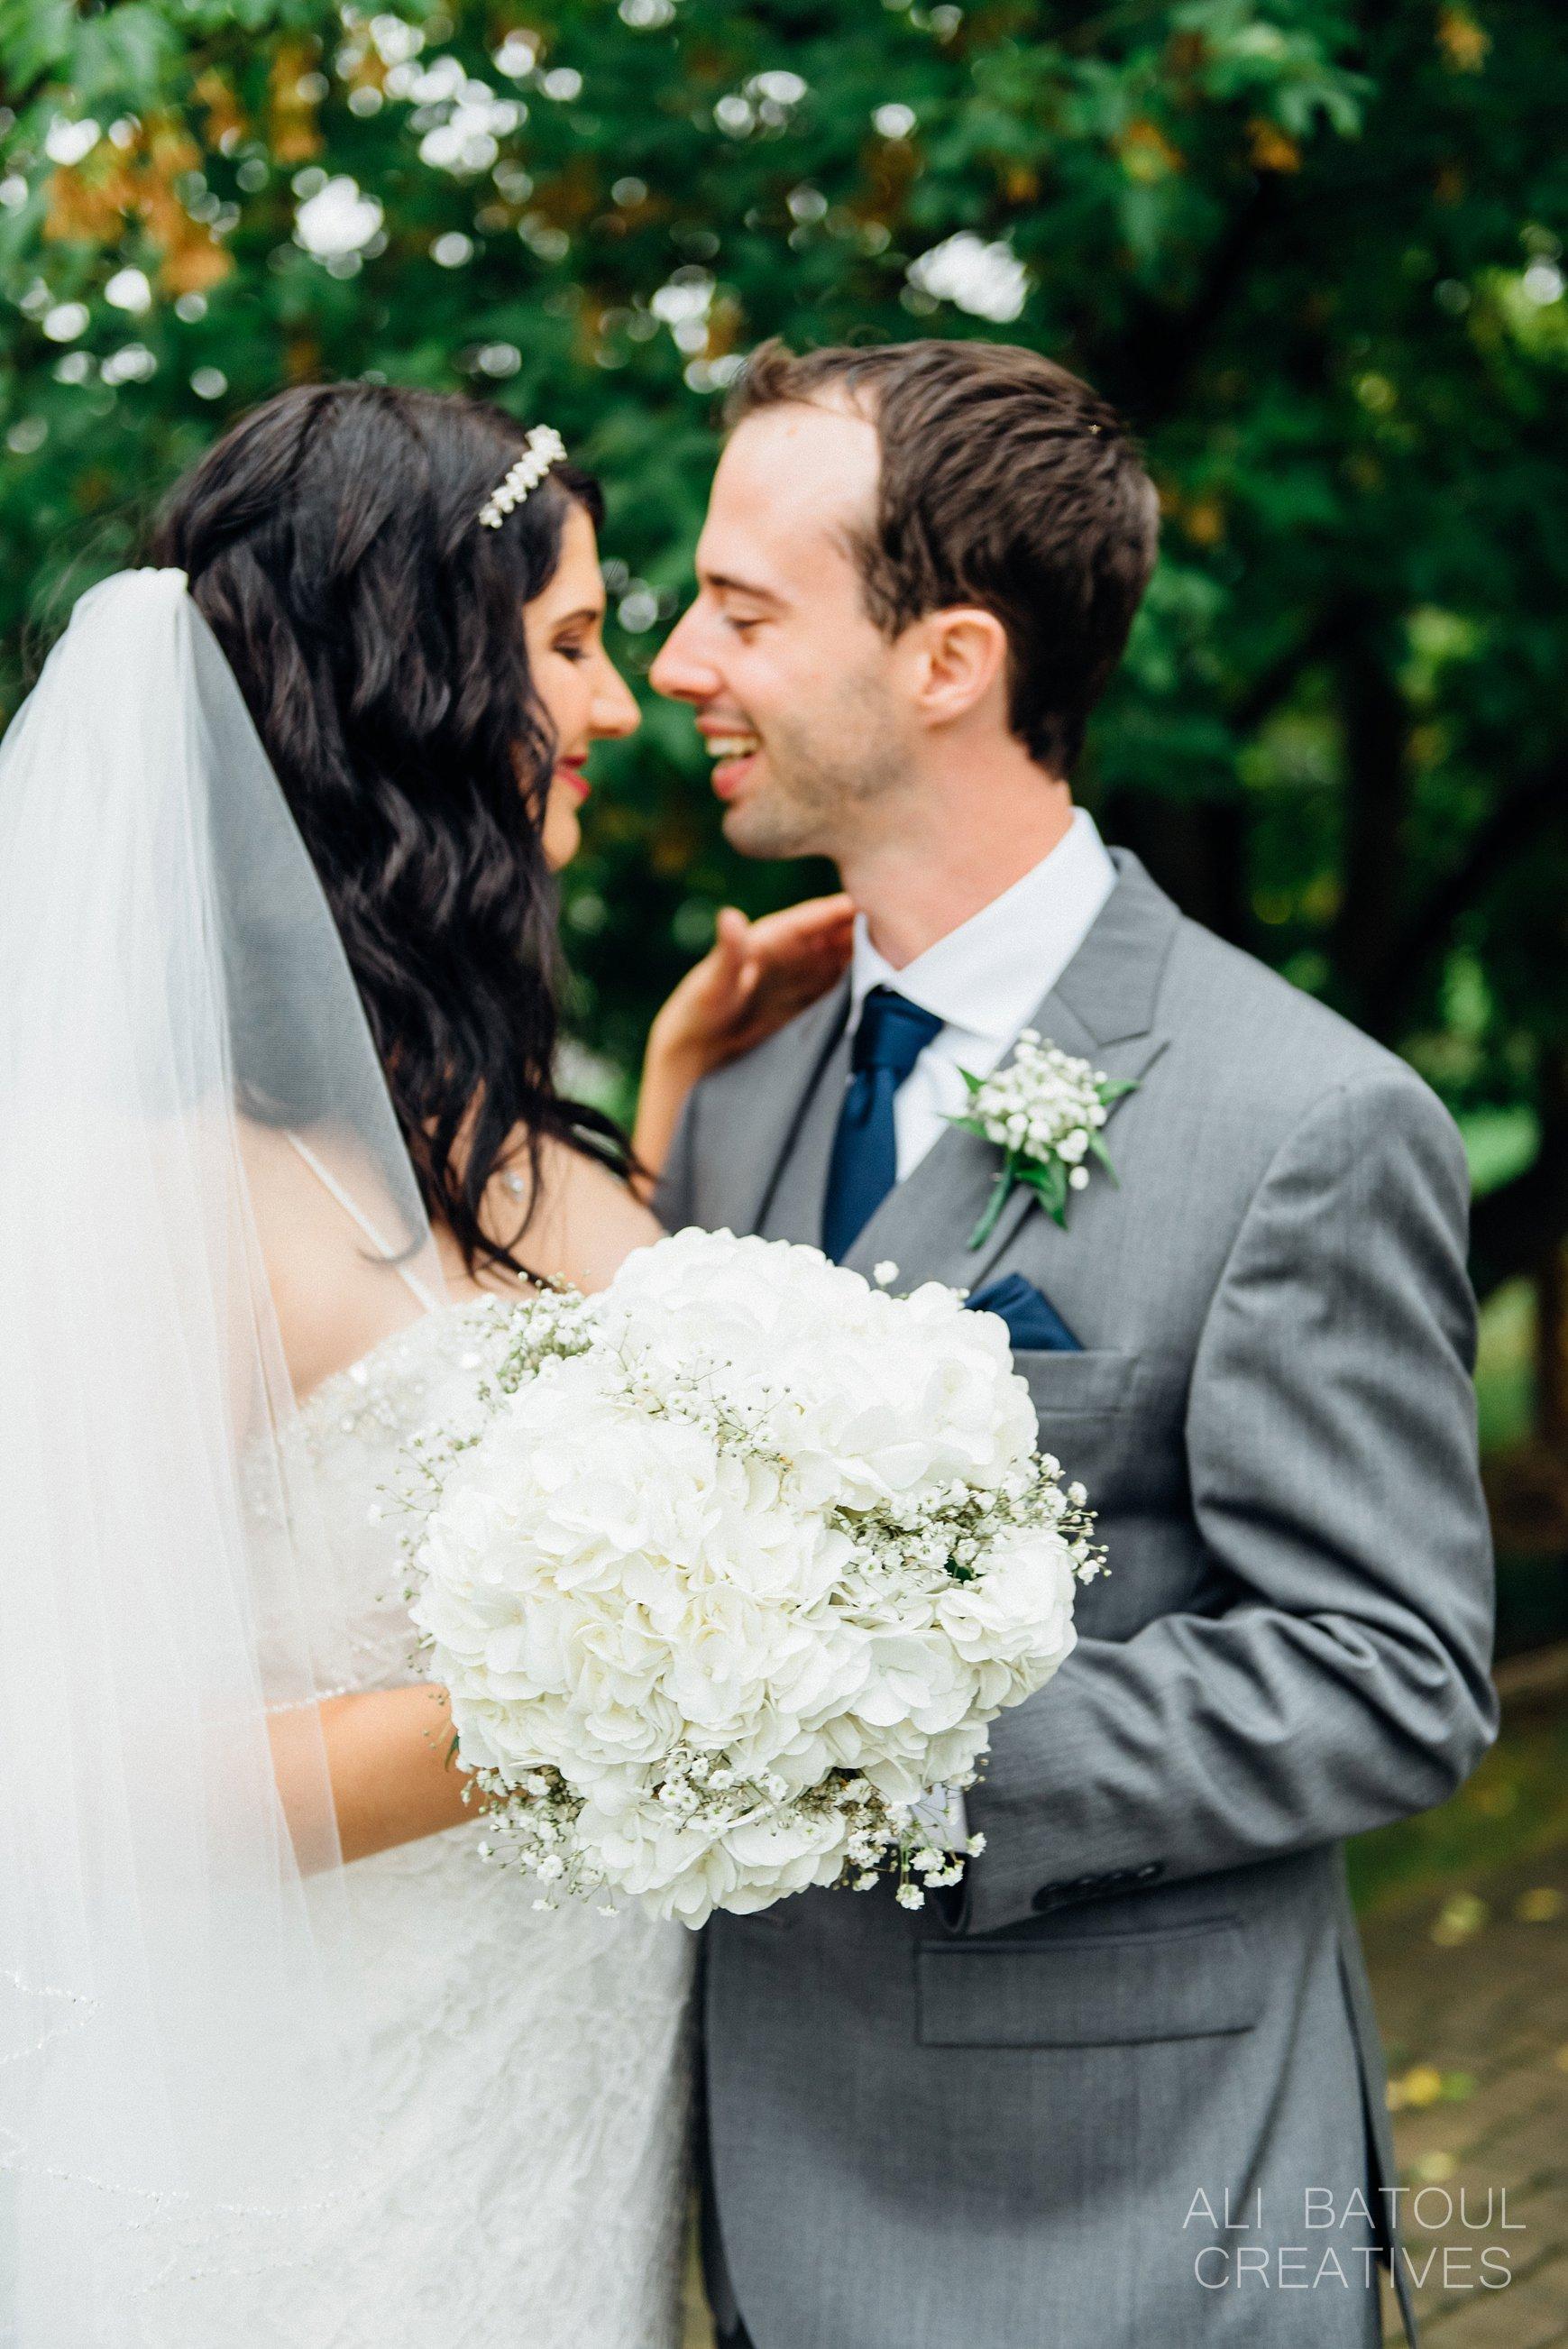 Jocelyn + Steve At The Schoolhouse Wedding - Ali and Batoul Fine Art Wedding Photography_0034.jpg